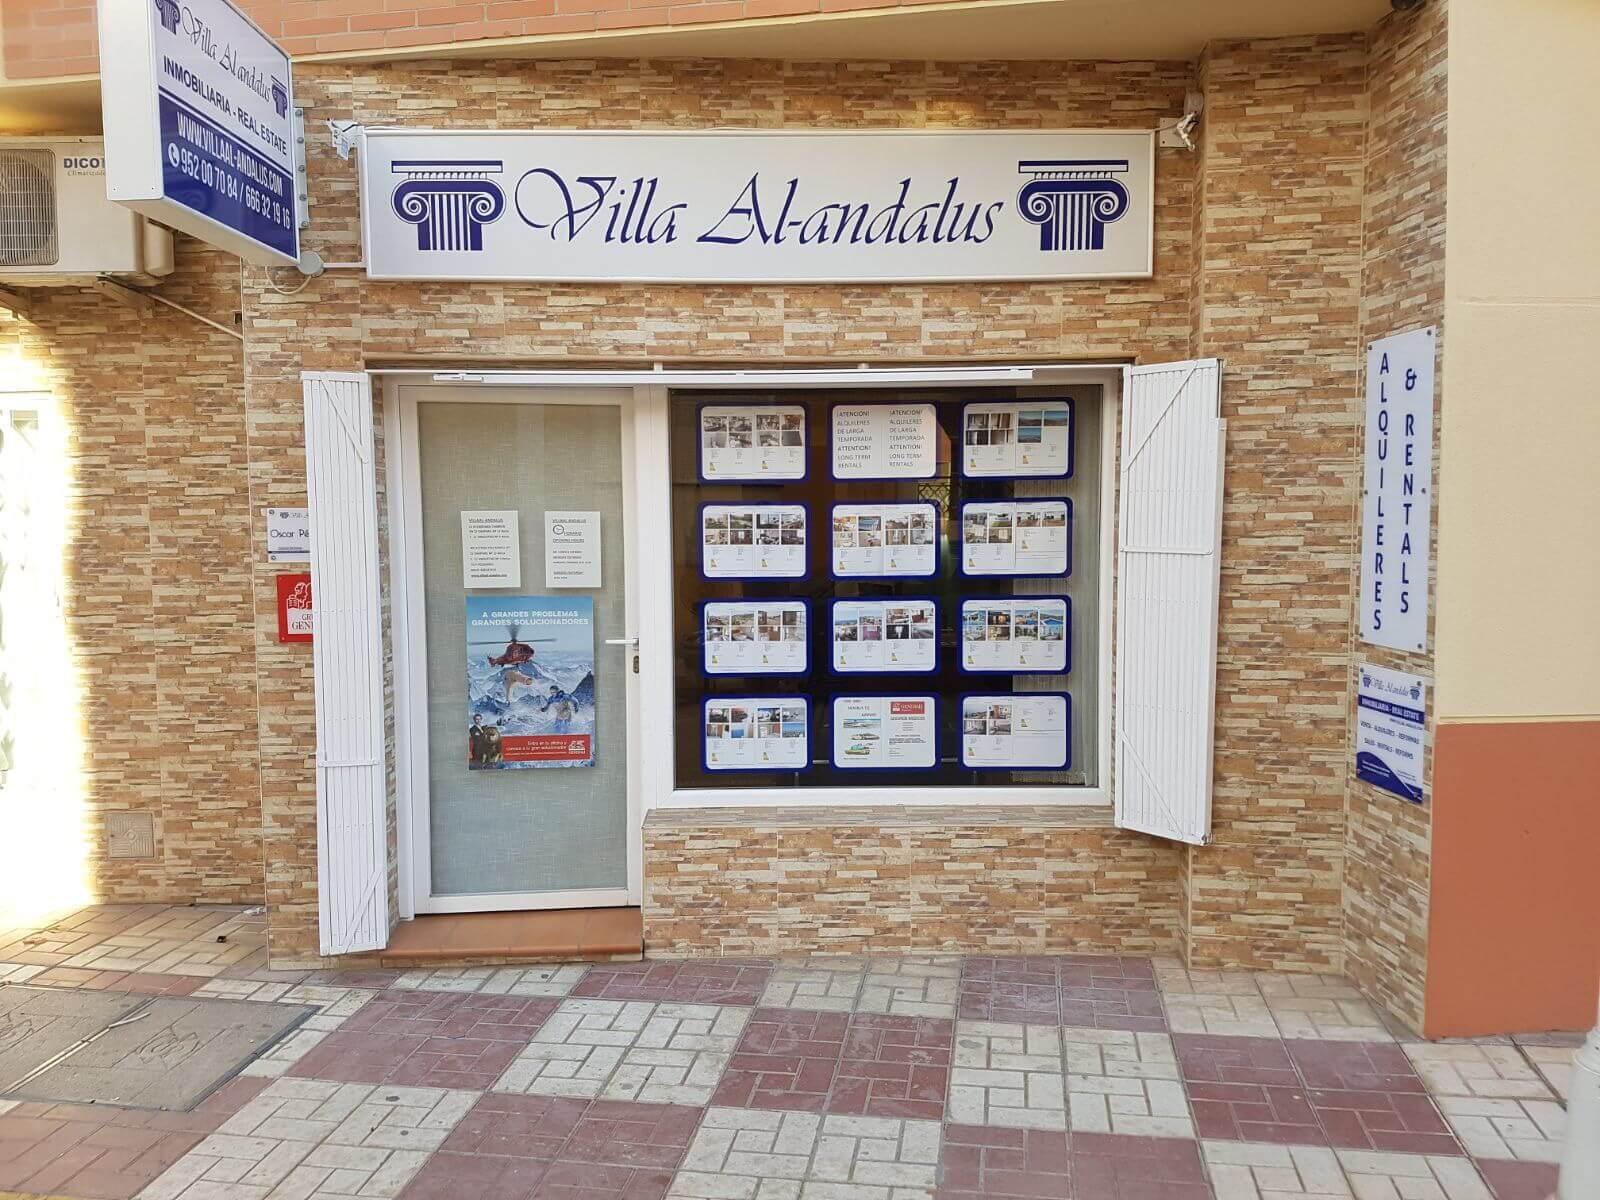 Oficina Villa Al Andalus en Torrox